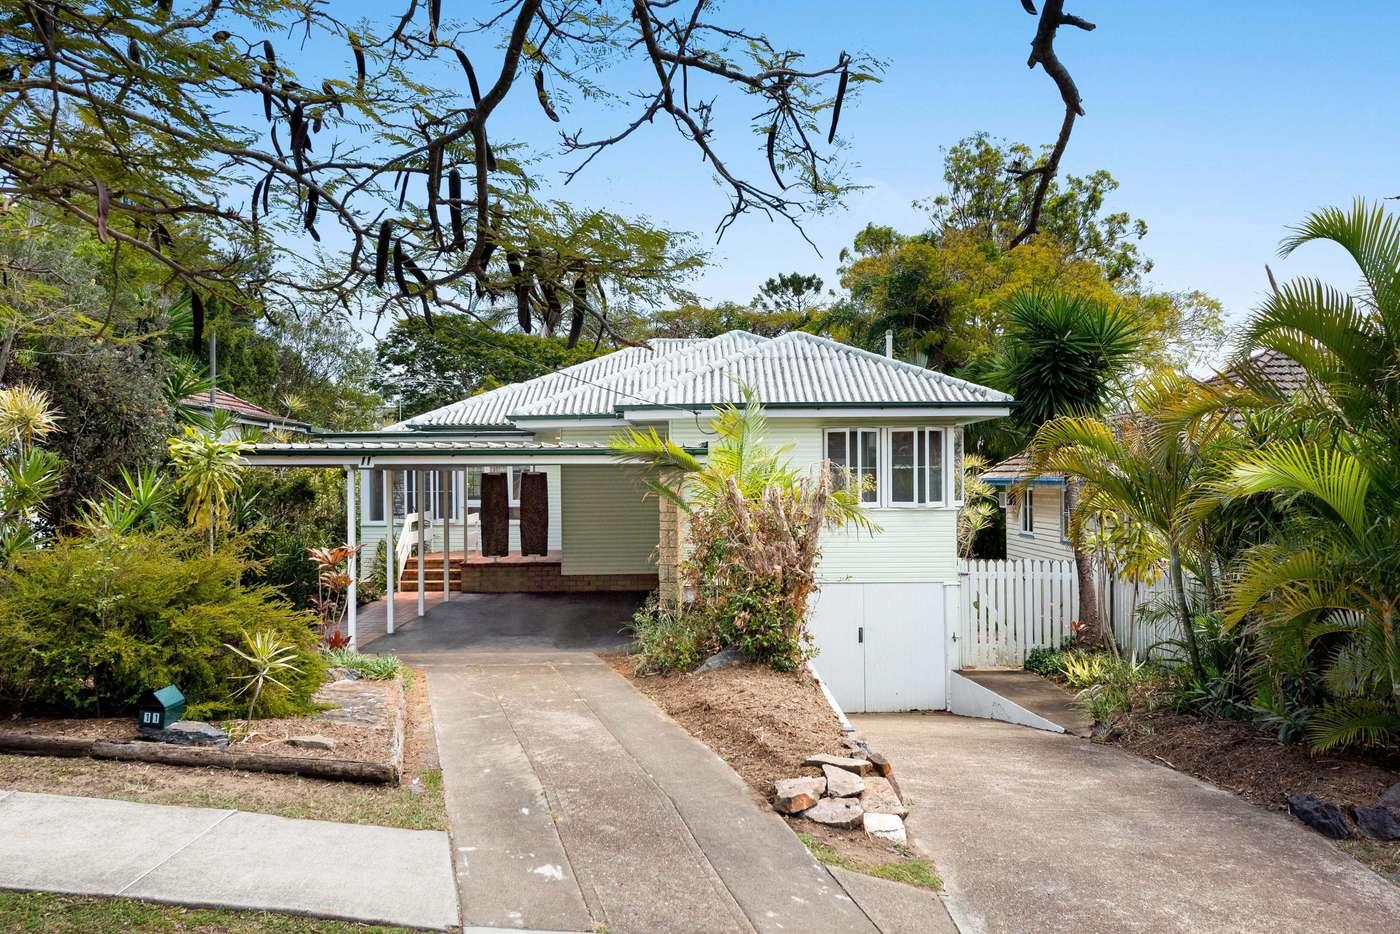 Main view of Homely house listing, 11 Gaynesford Street, Mount Gravatt QLD 4122